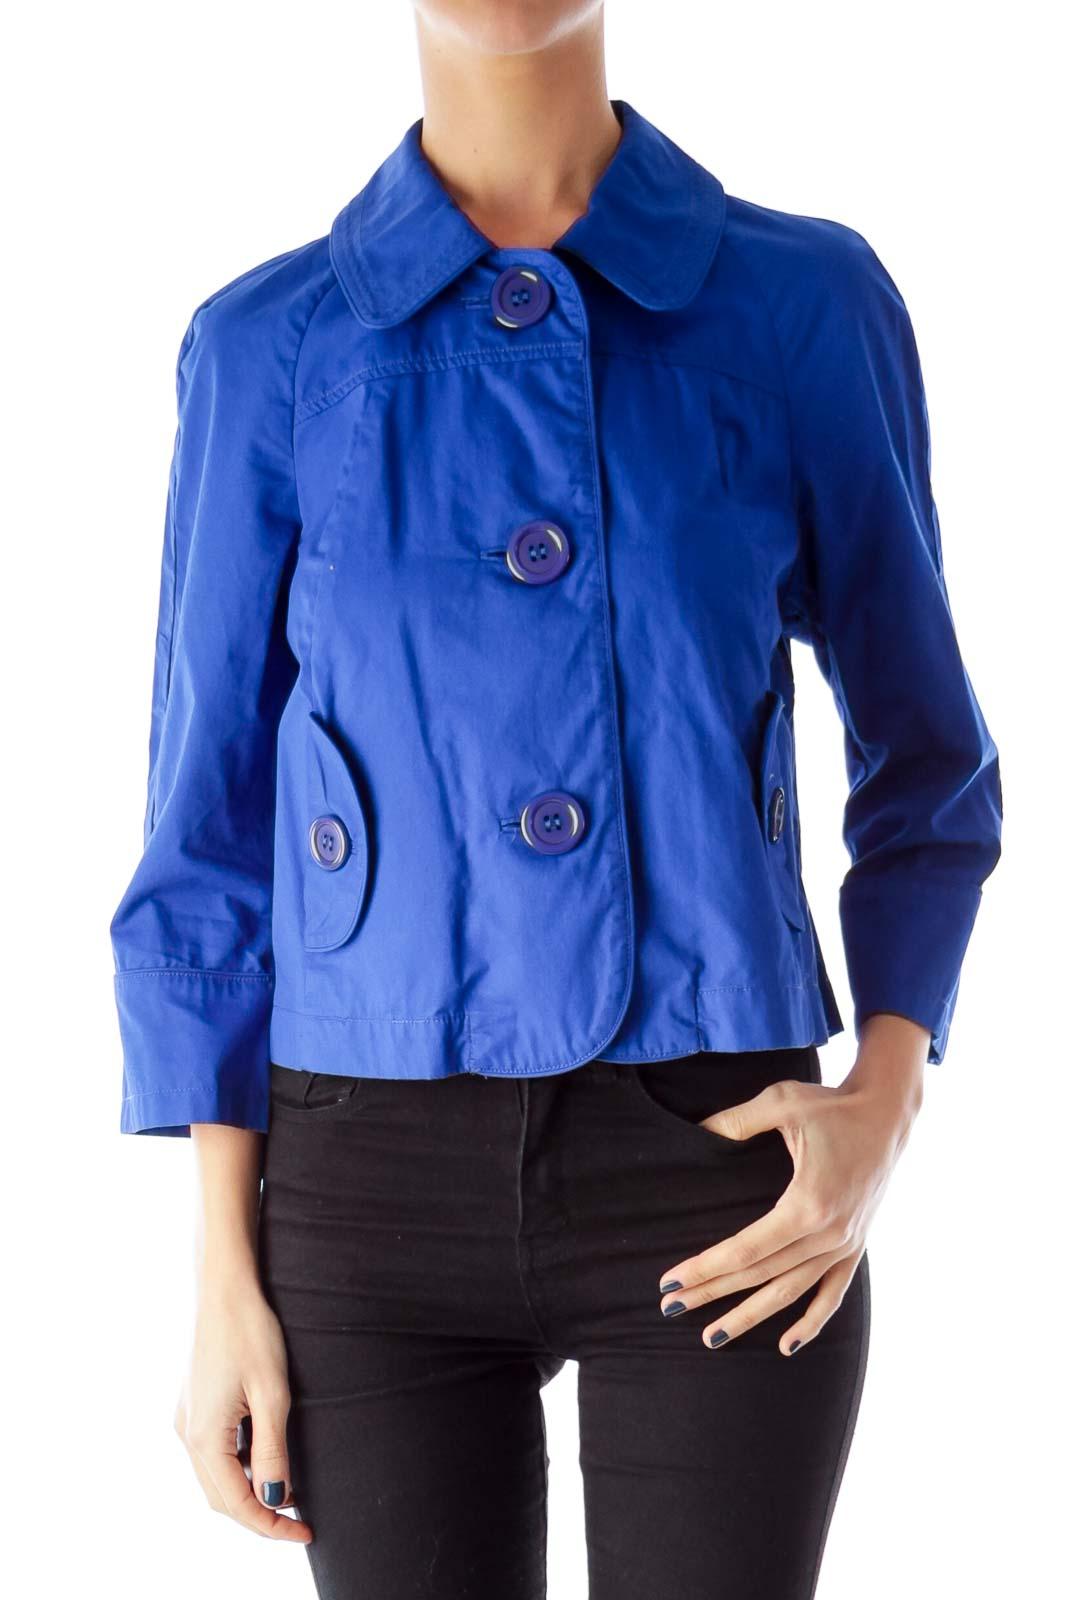 Blue 3/4 Sleeve Jacket